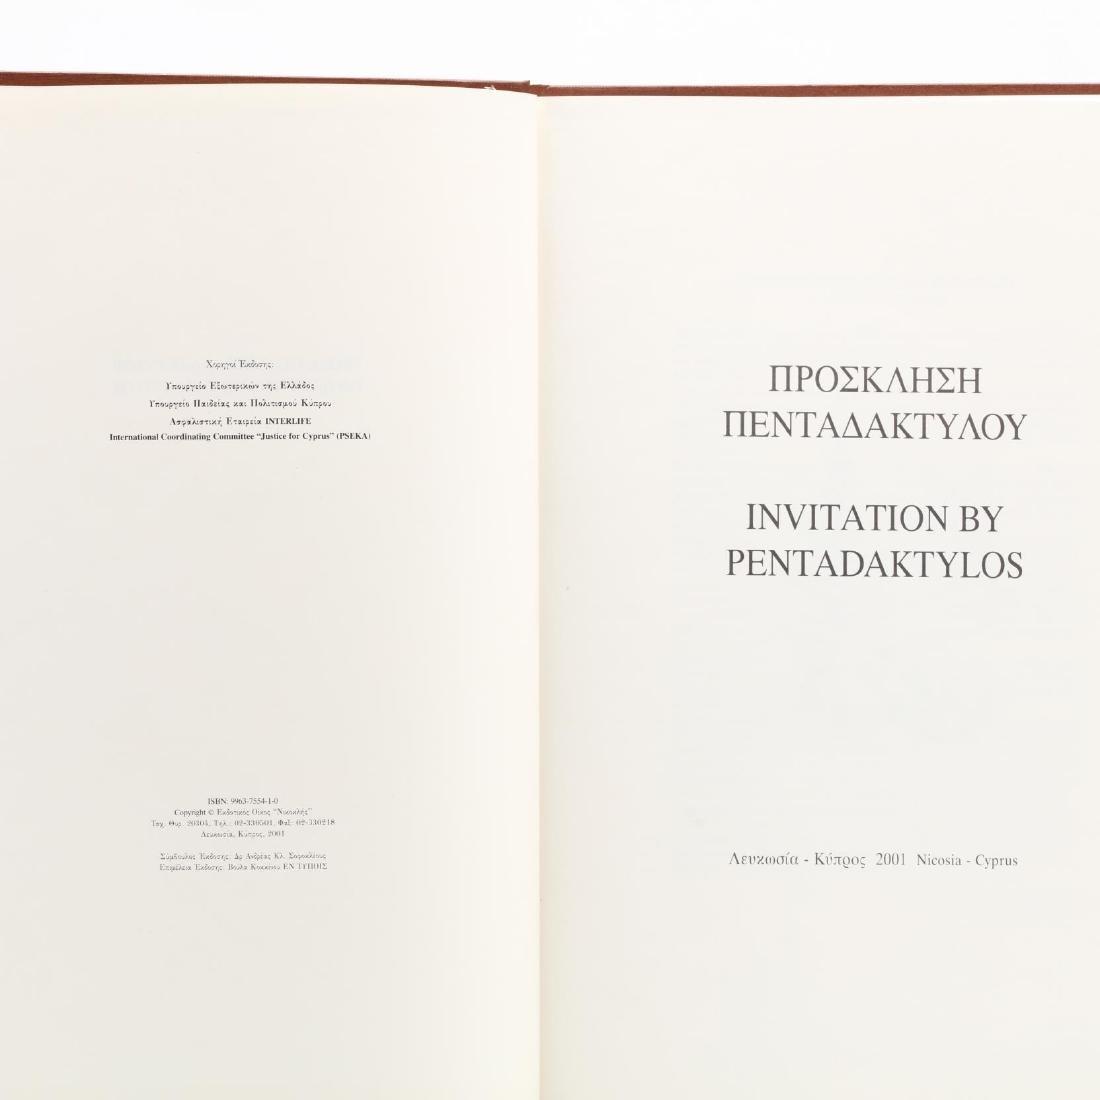 Invitation by Pentadaktylos - 2